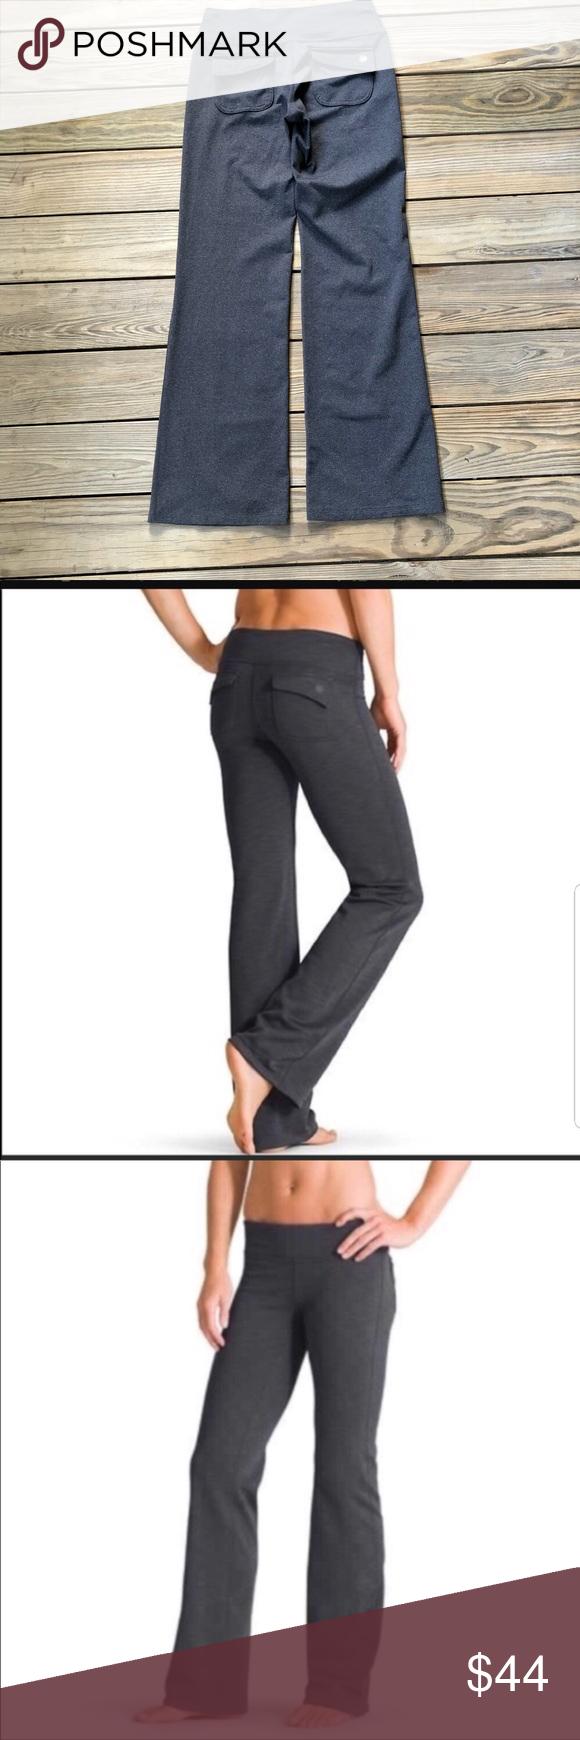 a7edc7319f614 Athleta Fusion Yoga Pants Flare Leg Flap Pocket Athleta Fusion Yoga Pants  Flare Leg Flap Back